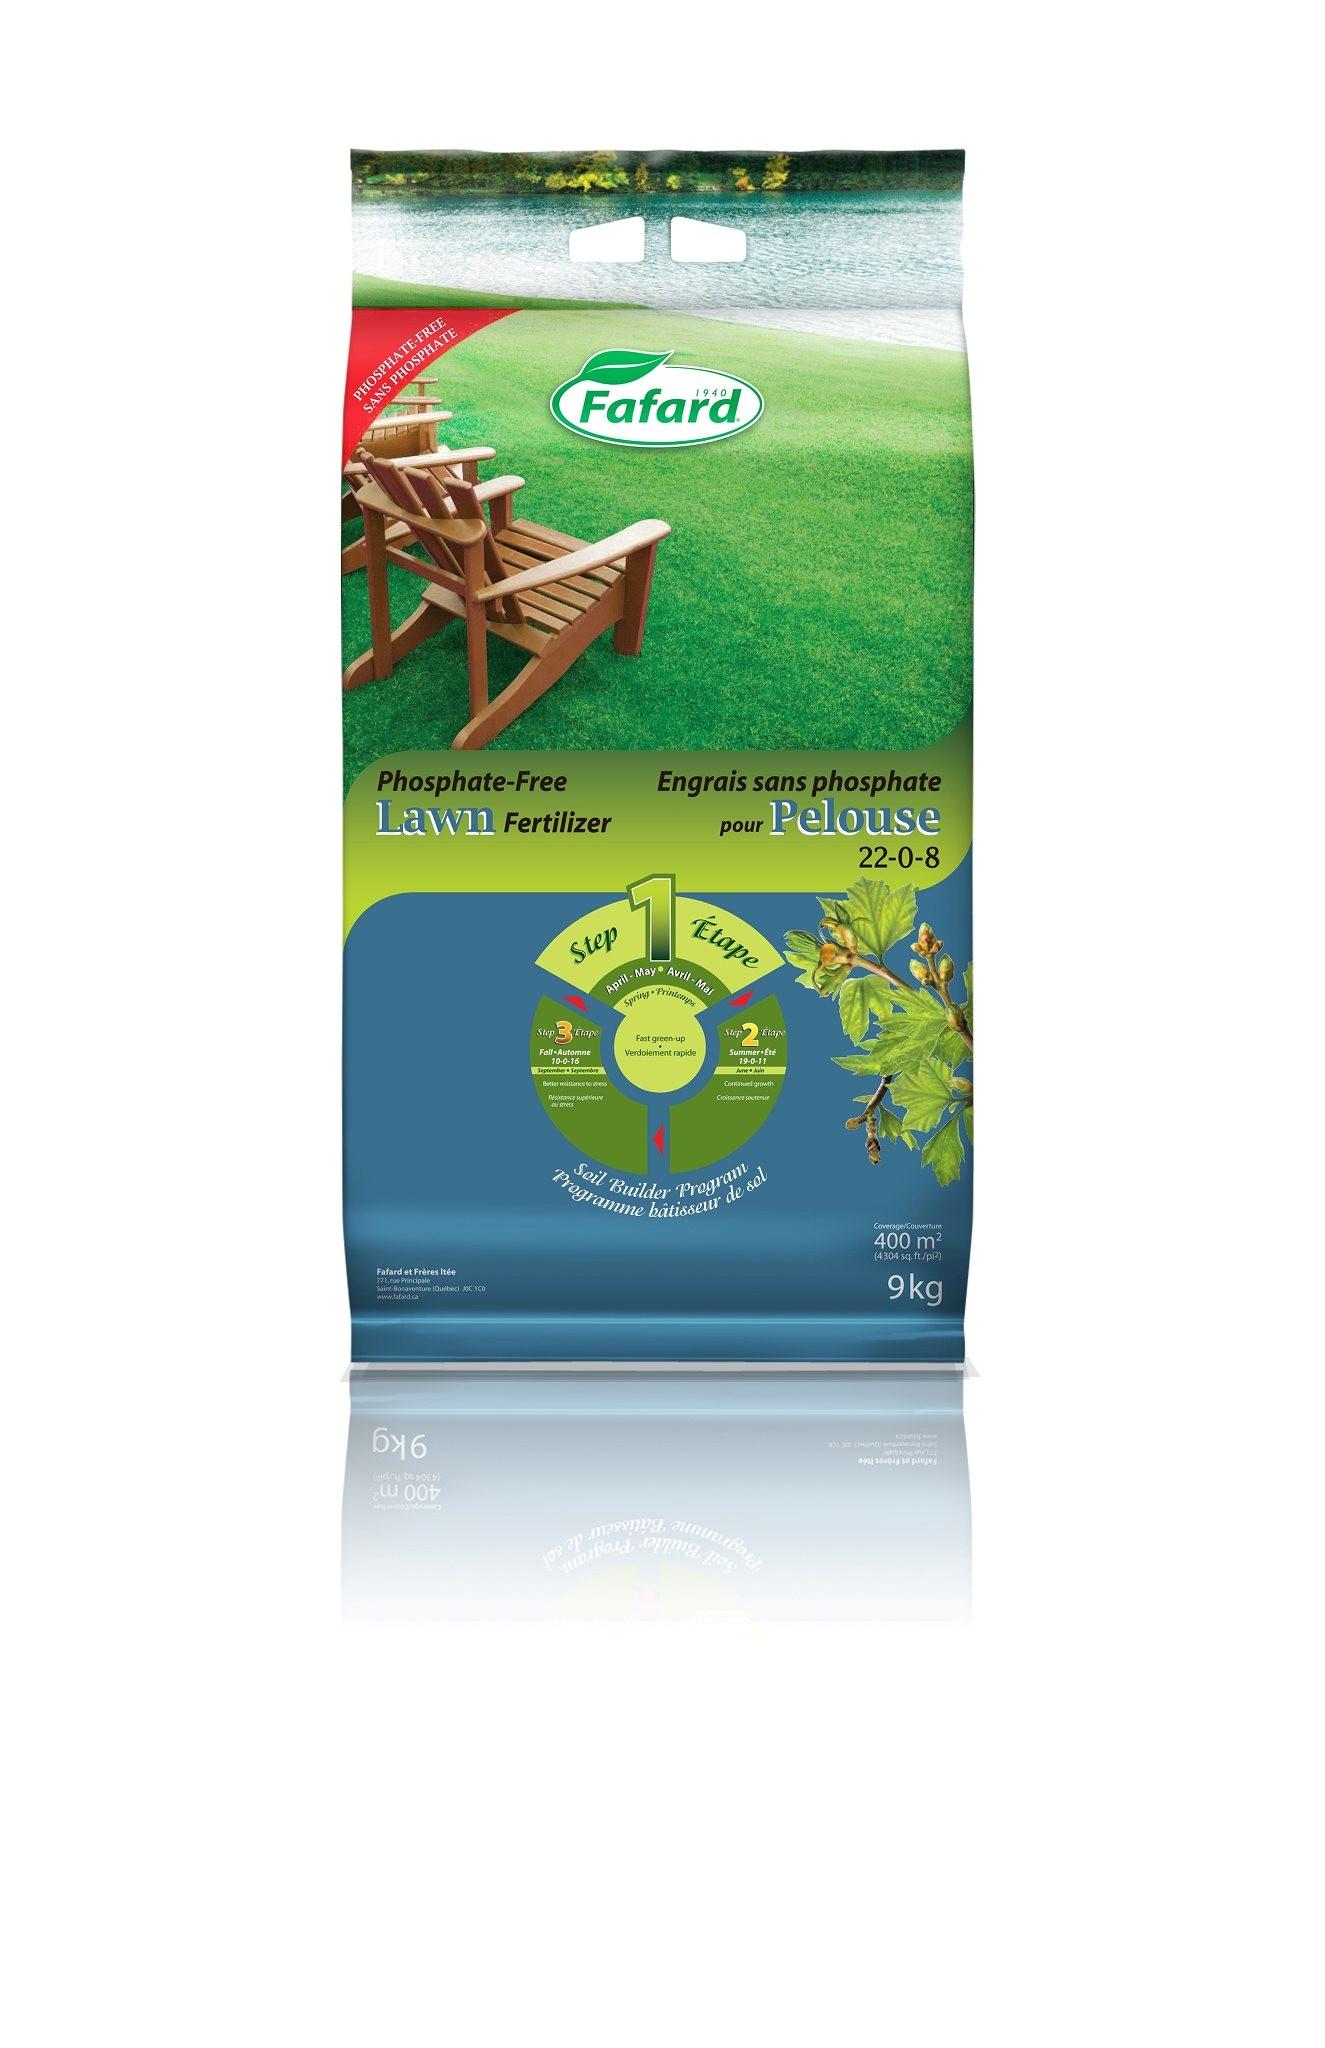 Engrais pelouse printemps 22 0 8 fafard nos produits - Engrais gazon printemps ...